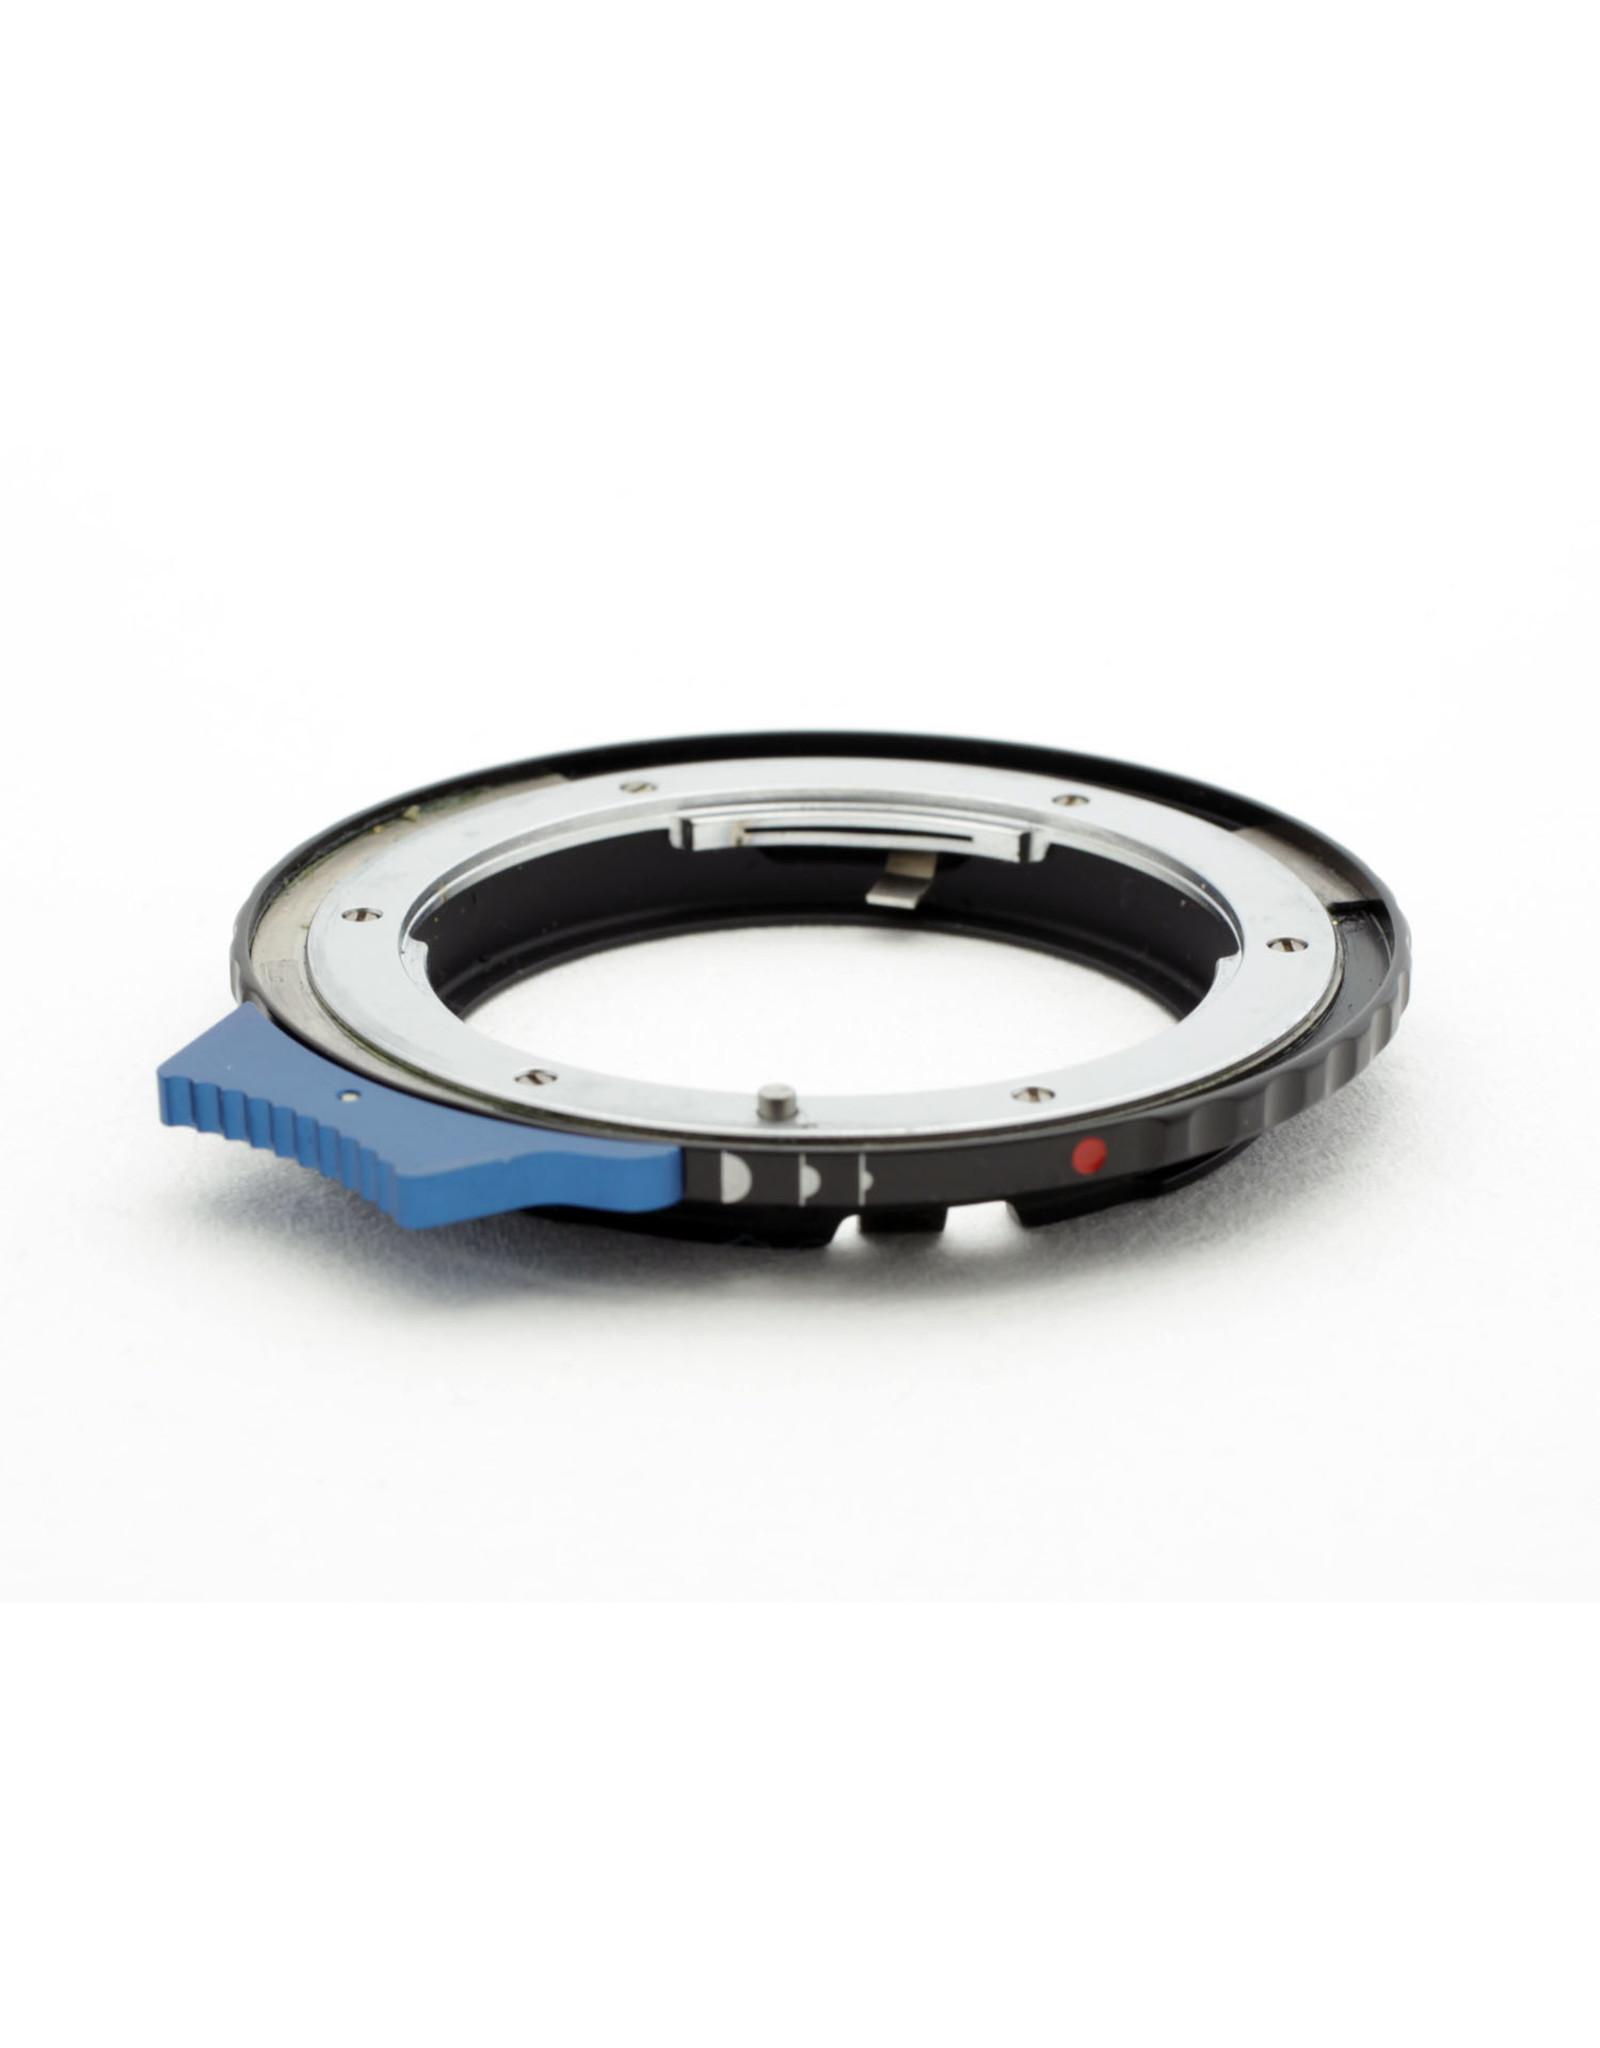 Novoflex Novoflex Nikon G to EOS Mount Adapter   AP2121014